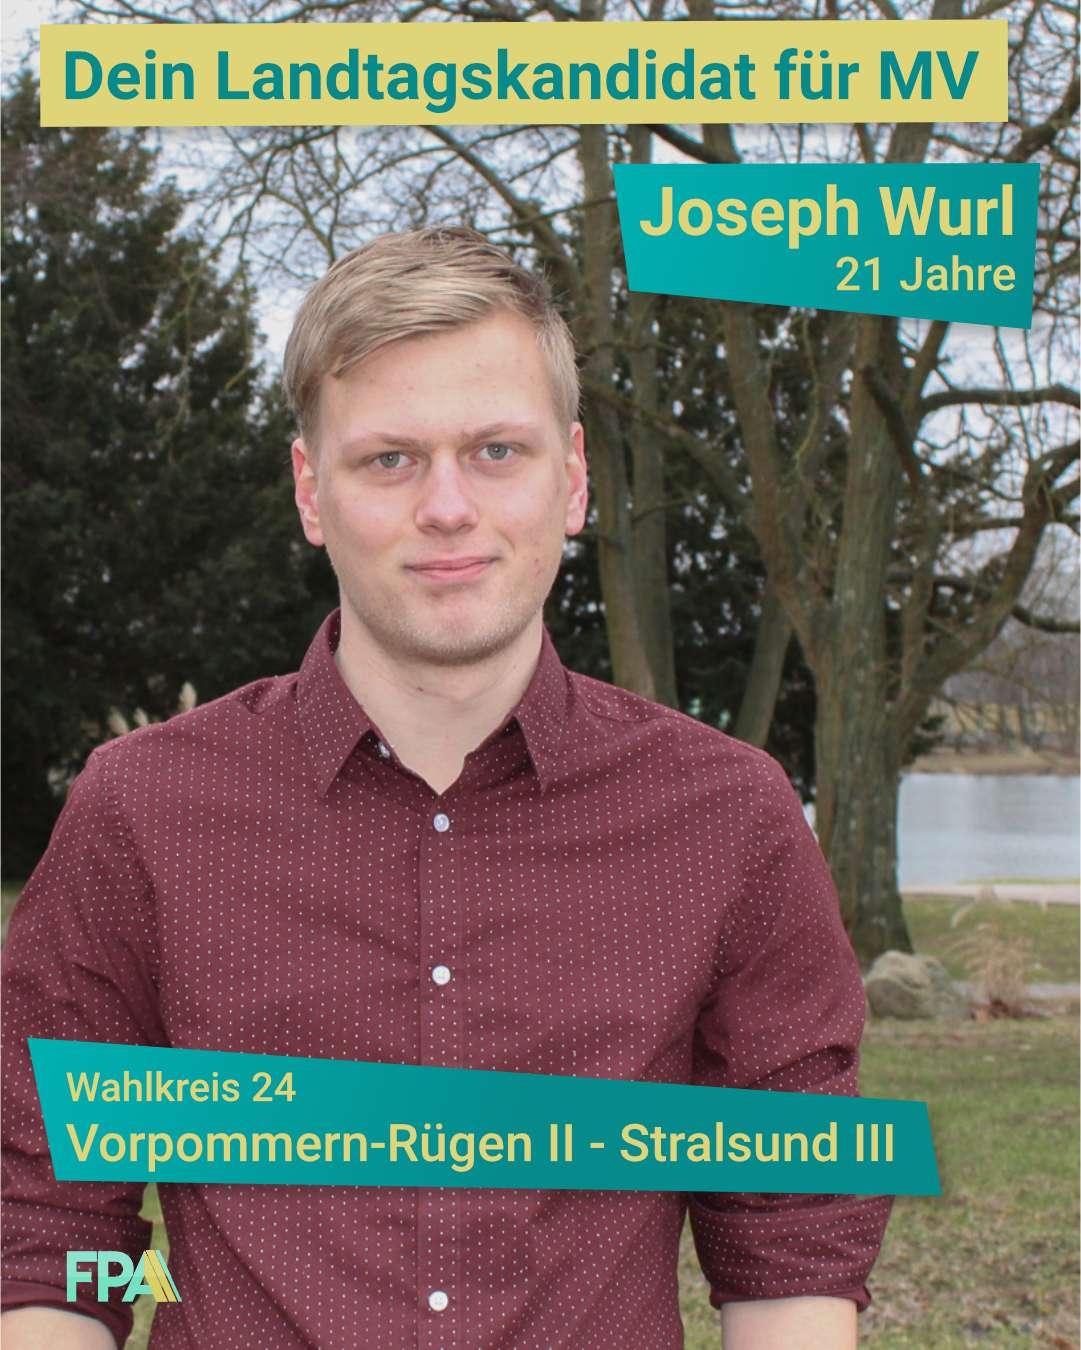 Joseph Wurl